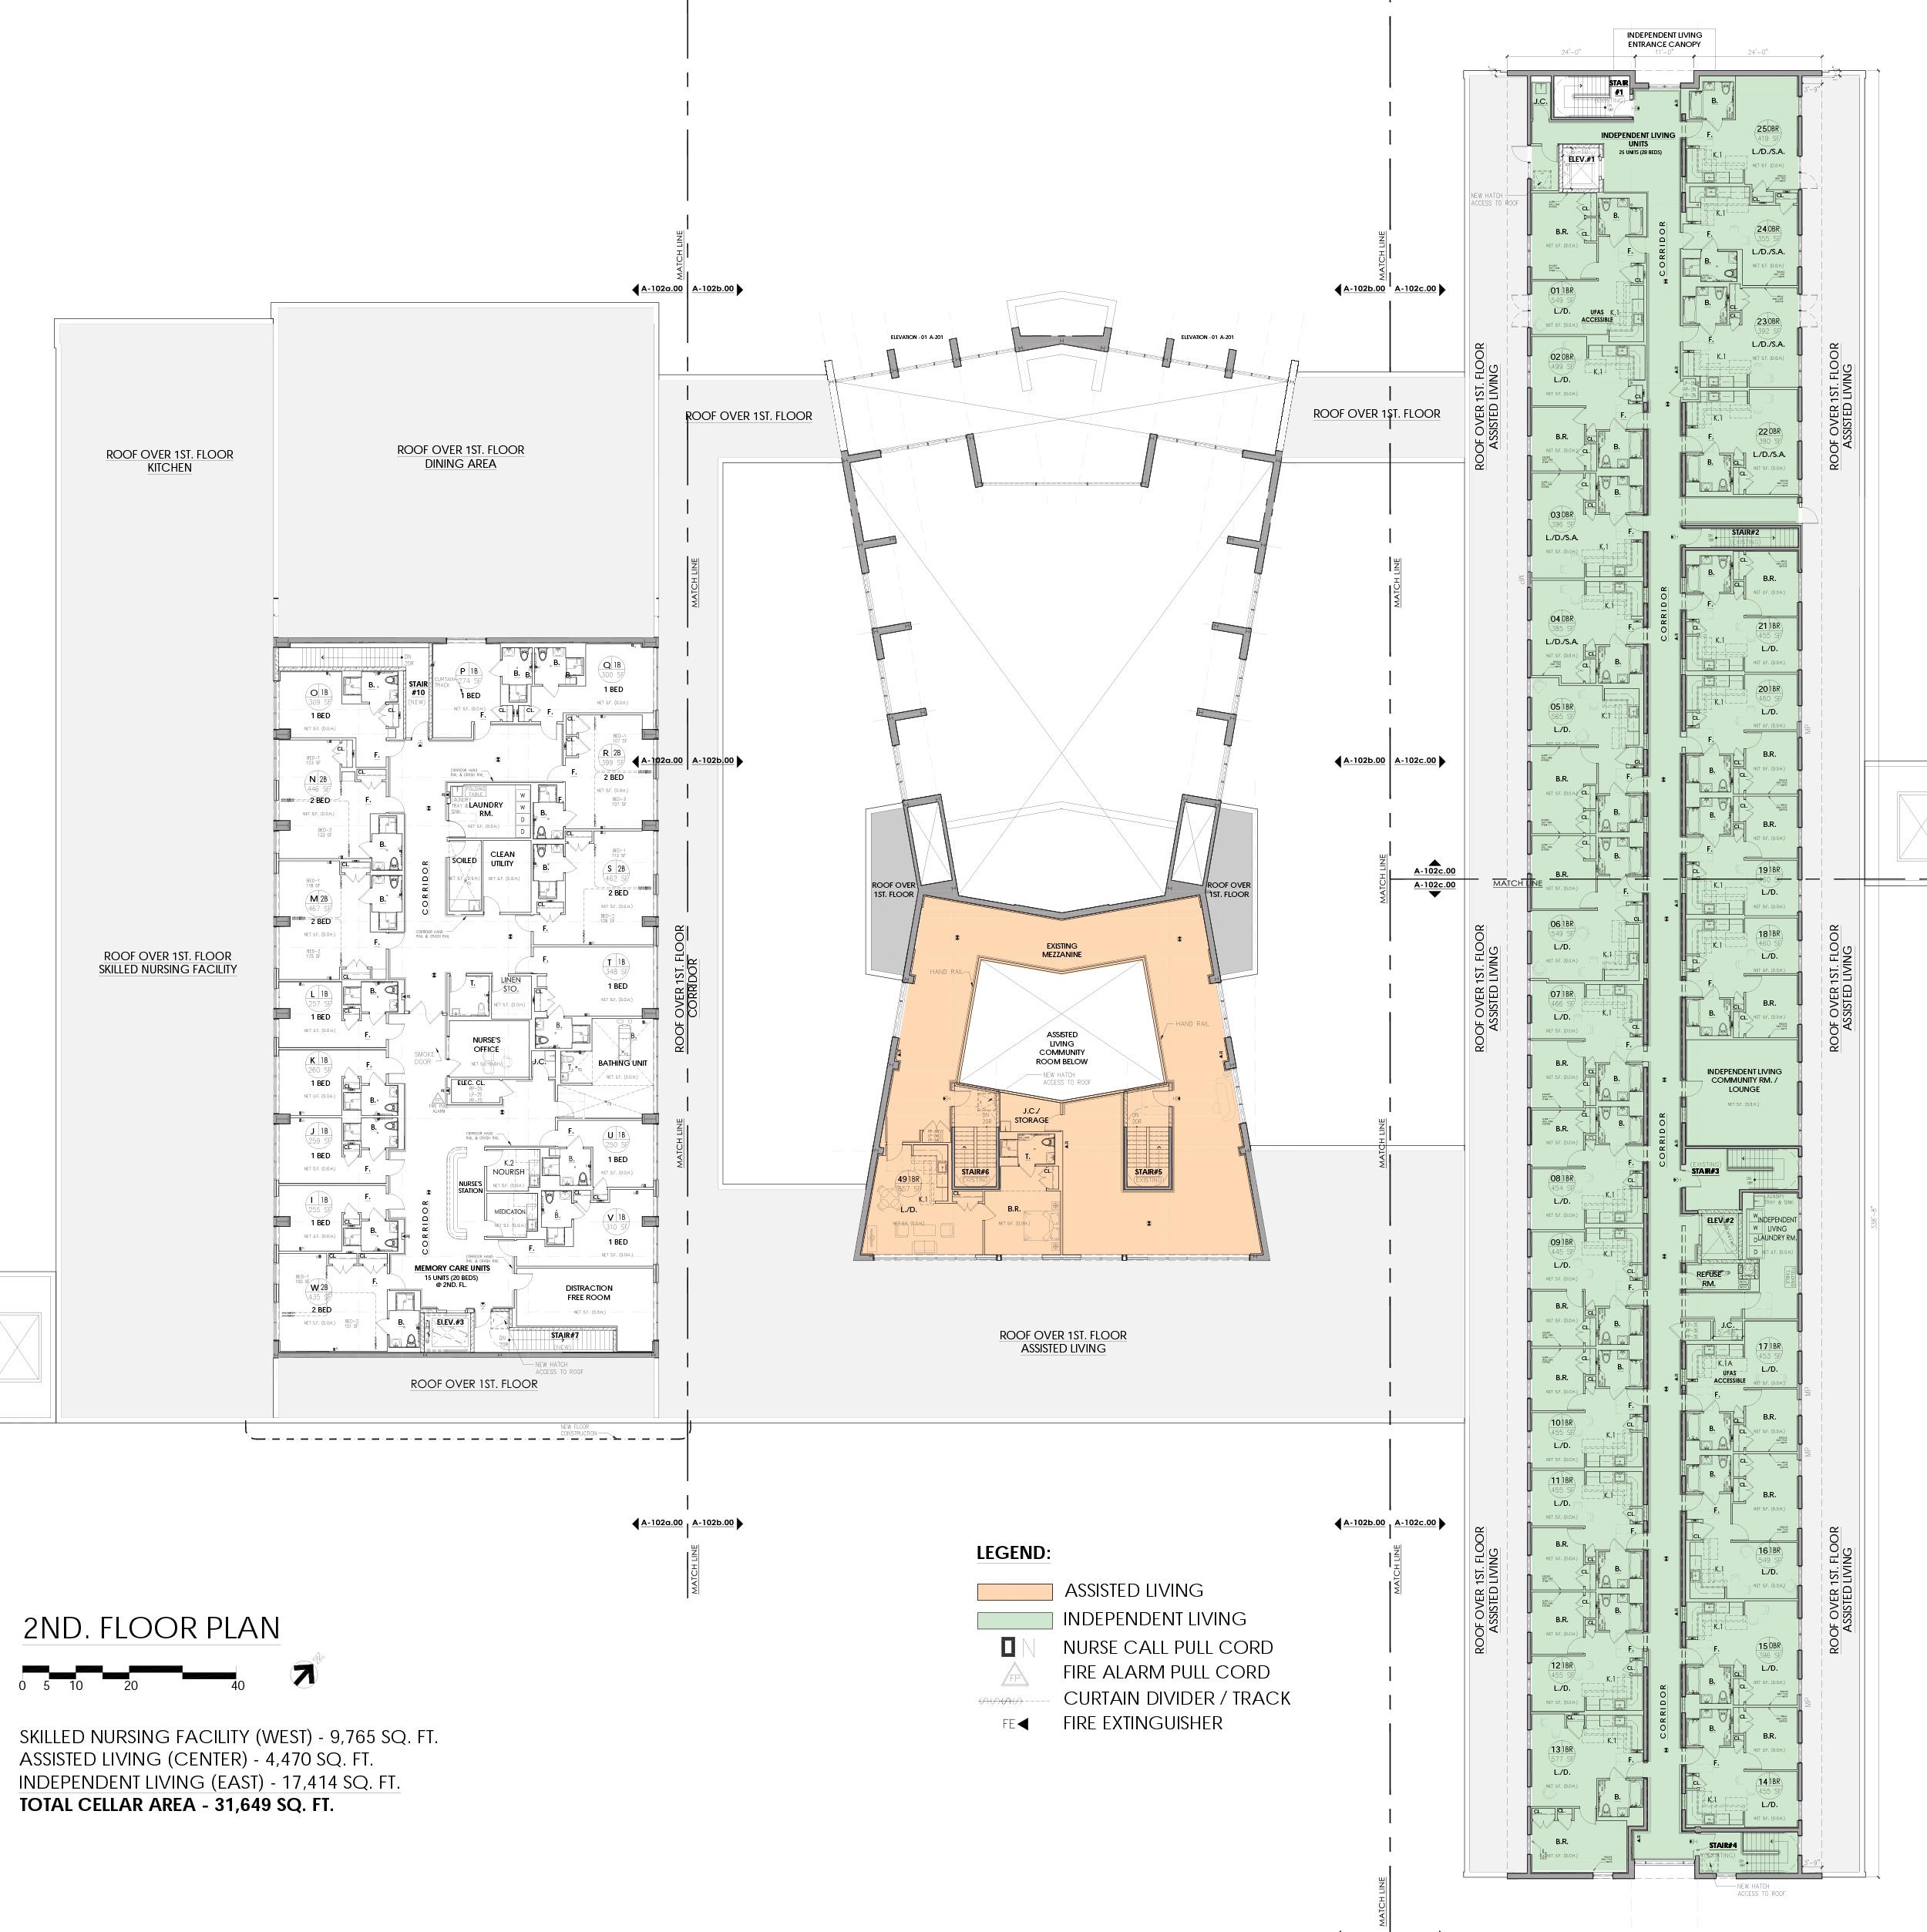 02_2nd_floor_plan_entire.jpg